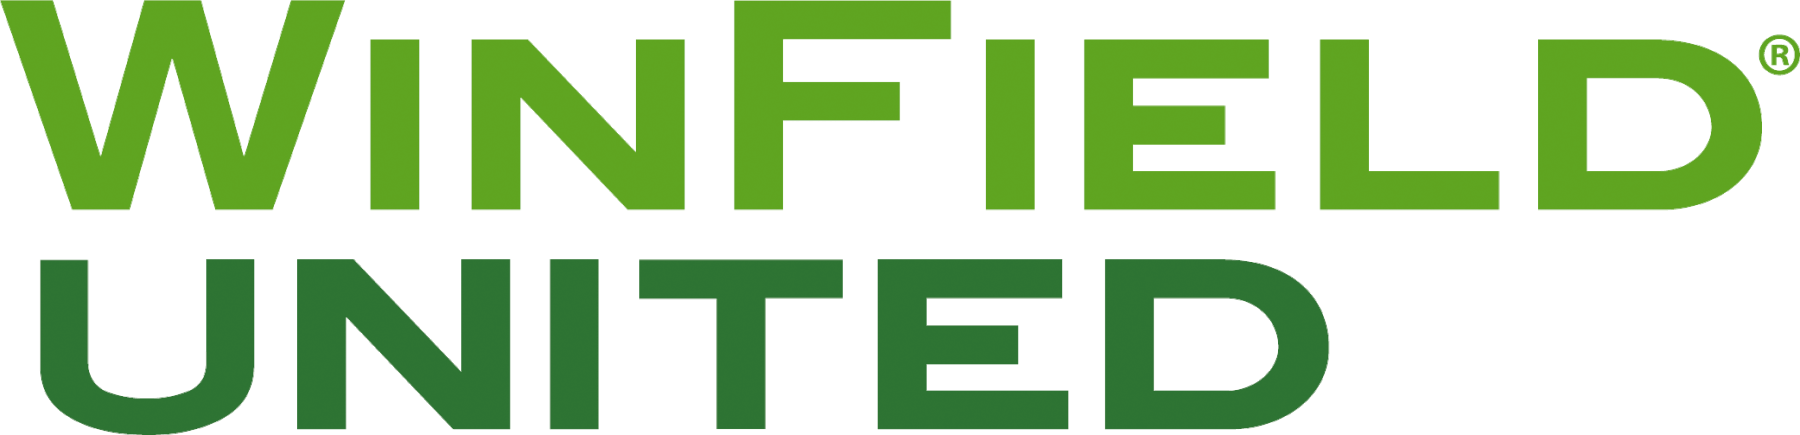 Winfield_logo